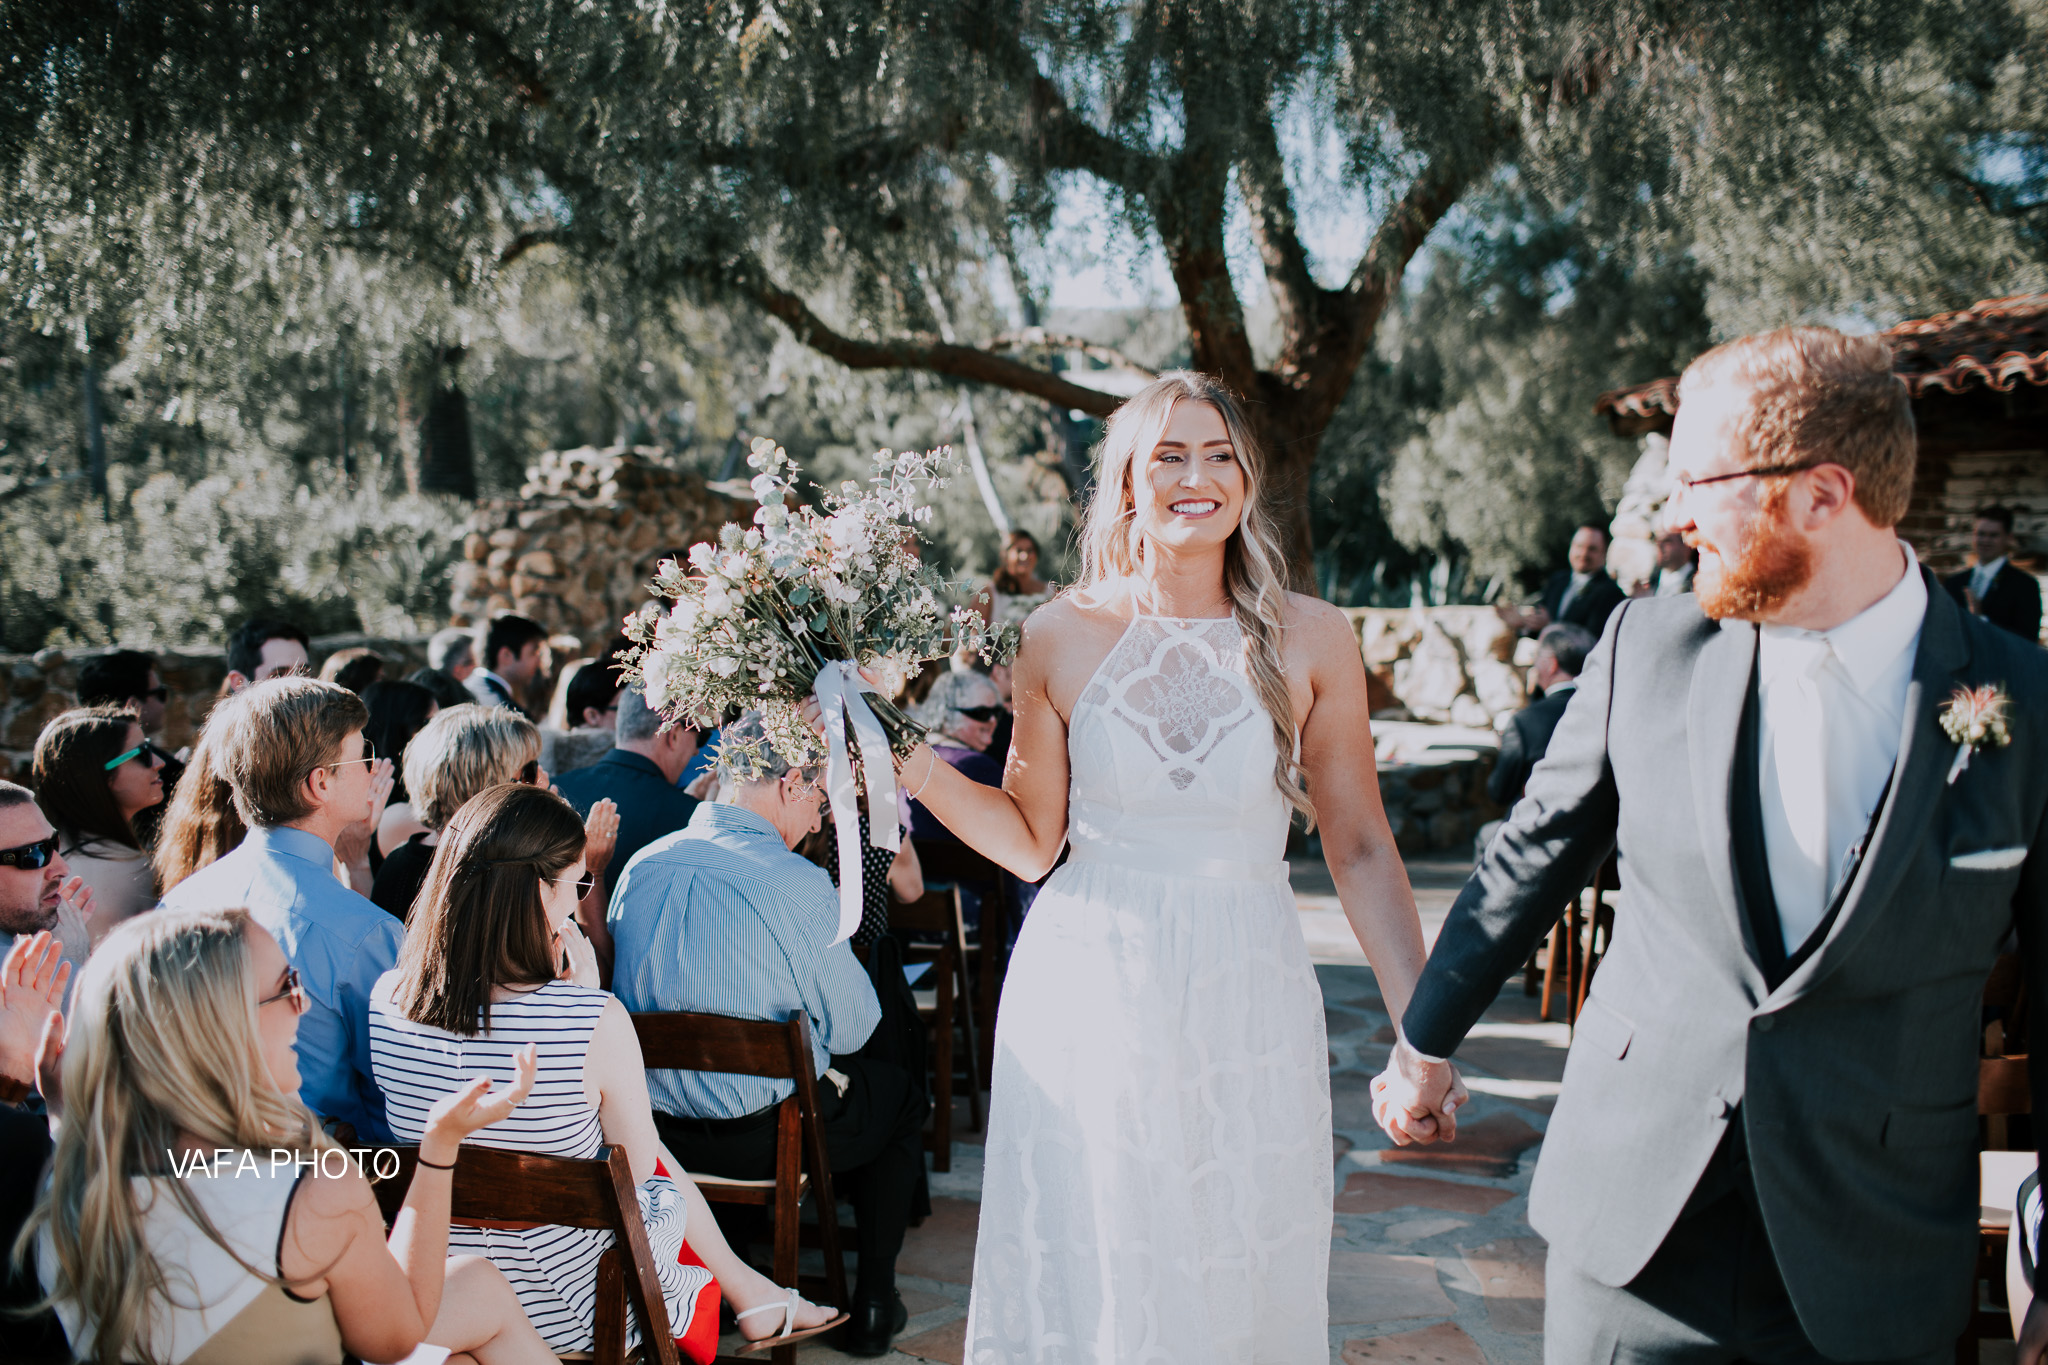 Leo-Carrillo-Ranch-Wedding-Lauren-Mike-Vafa-Photo-655.jpg